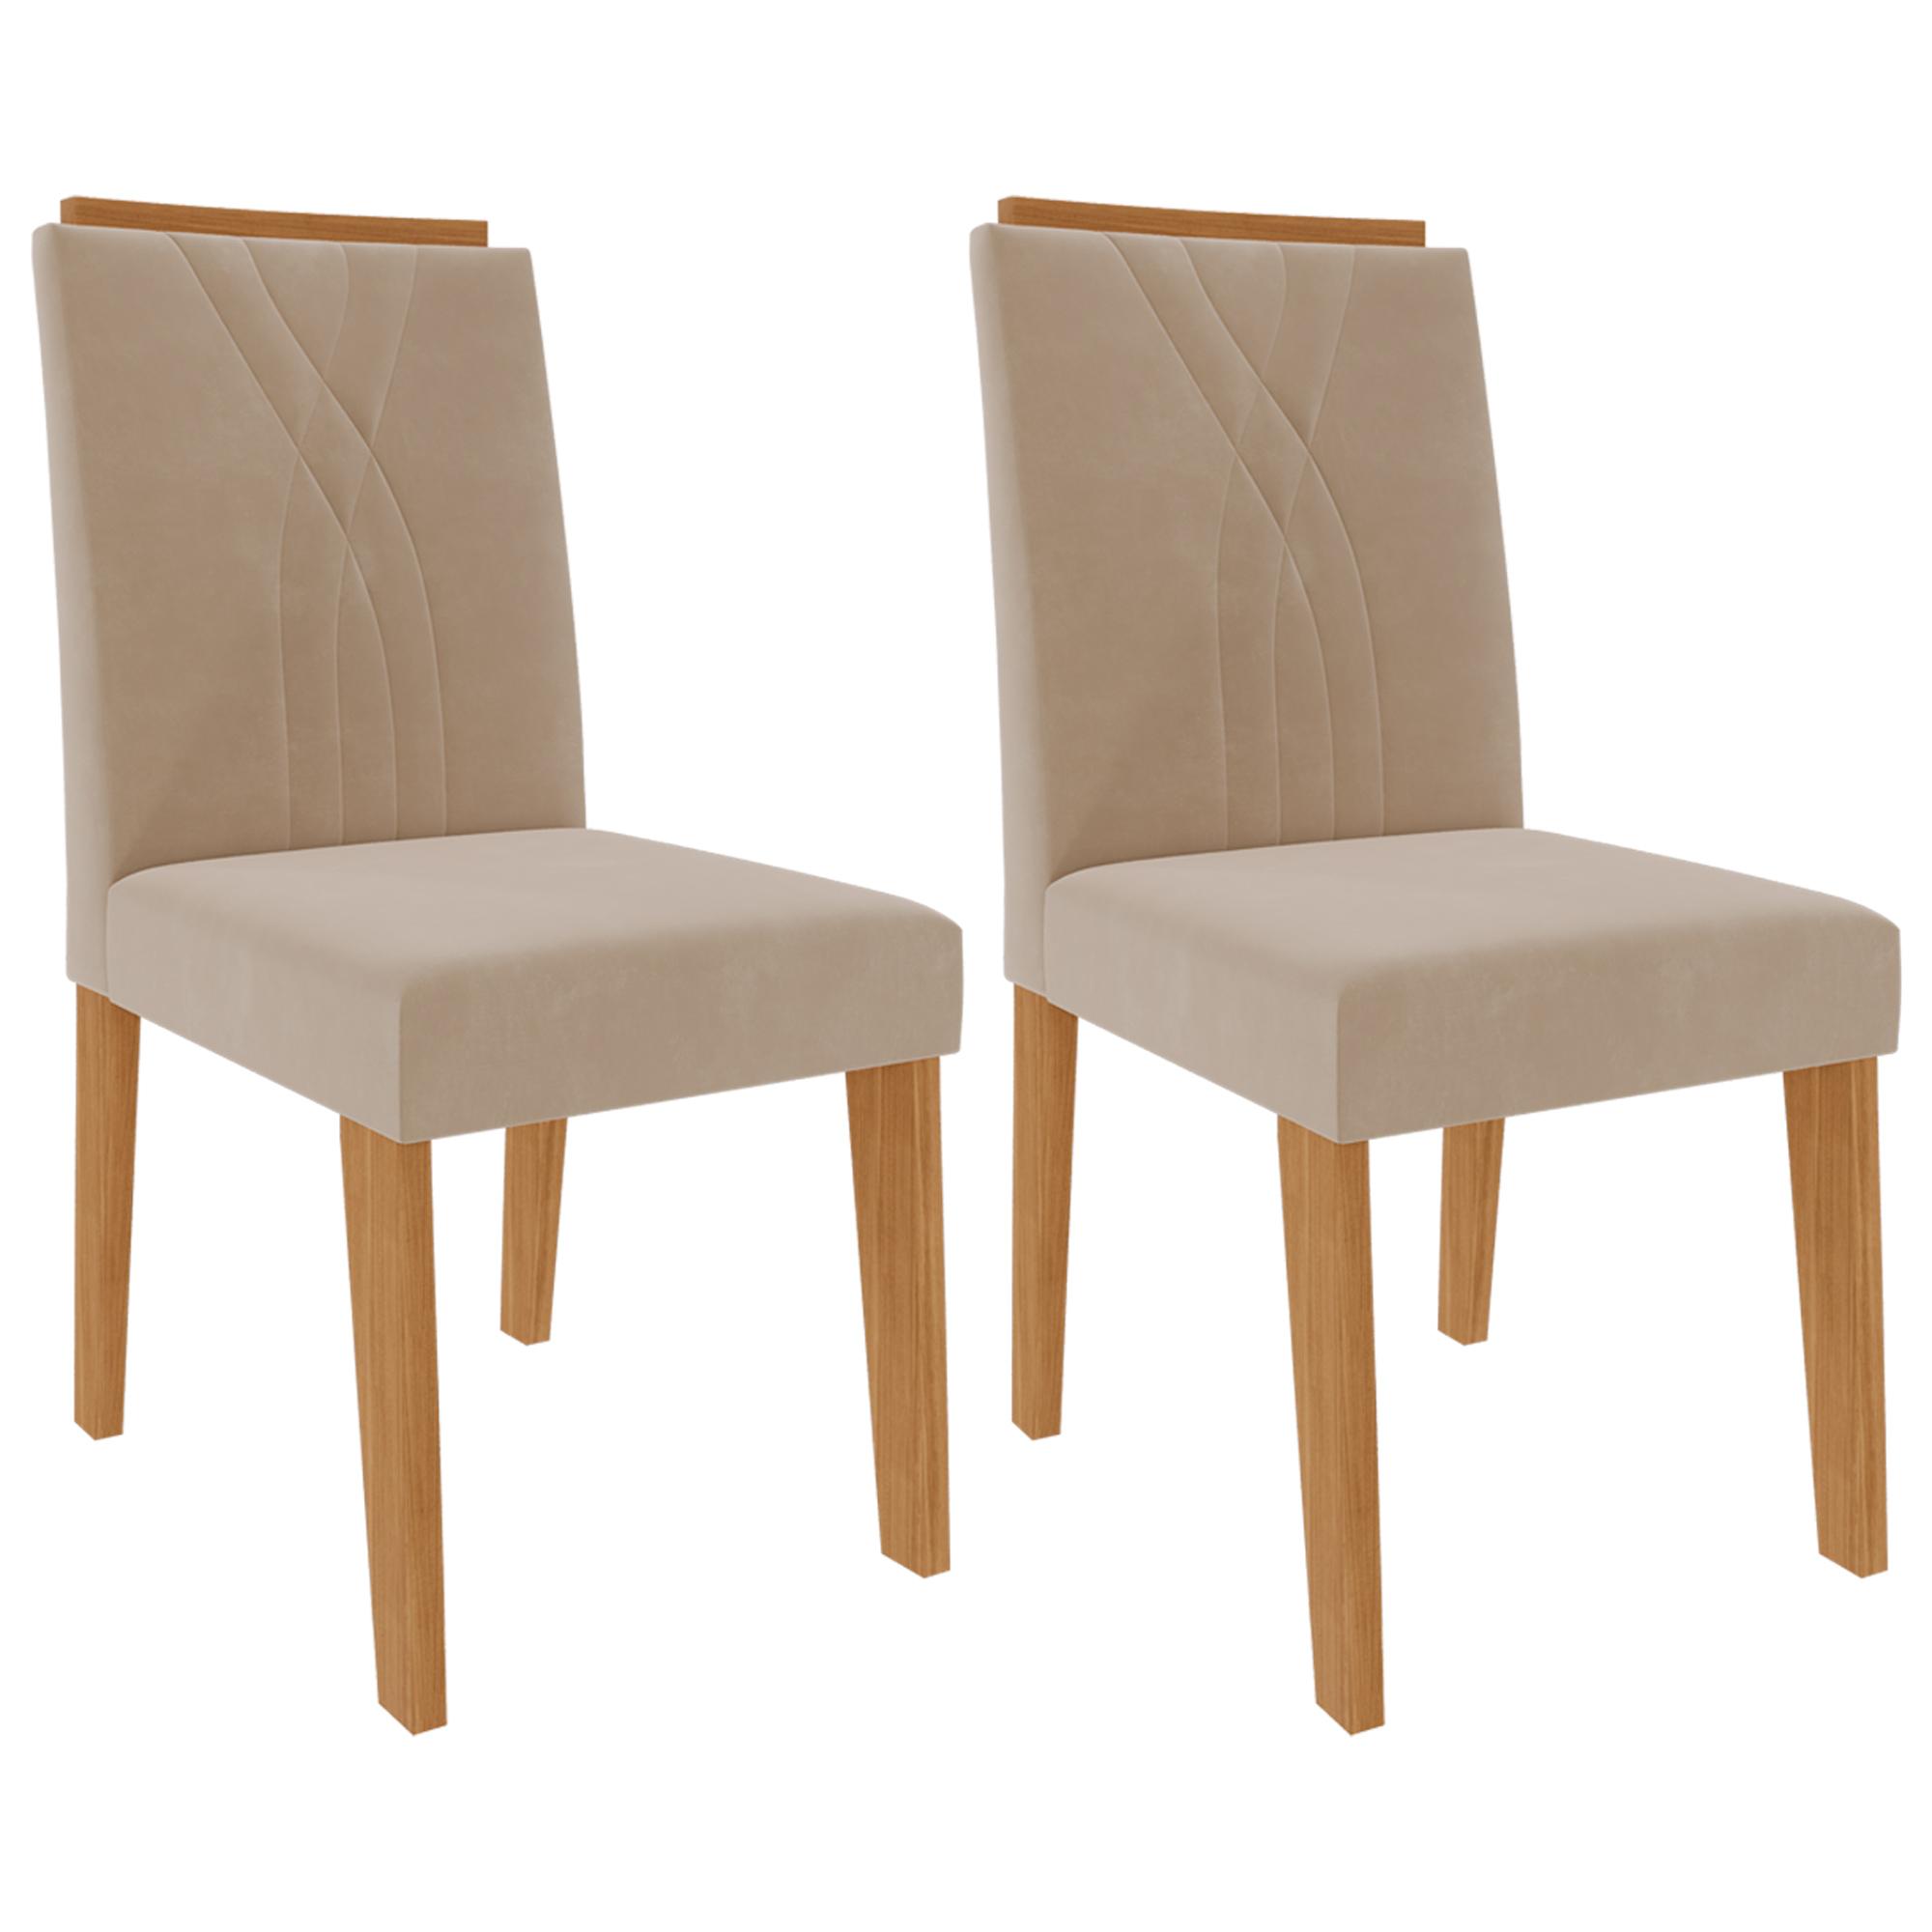 Cadeiras de MDF Para Sala de Jantar 02 Pçs Nicole  Cimol Nature/Nude